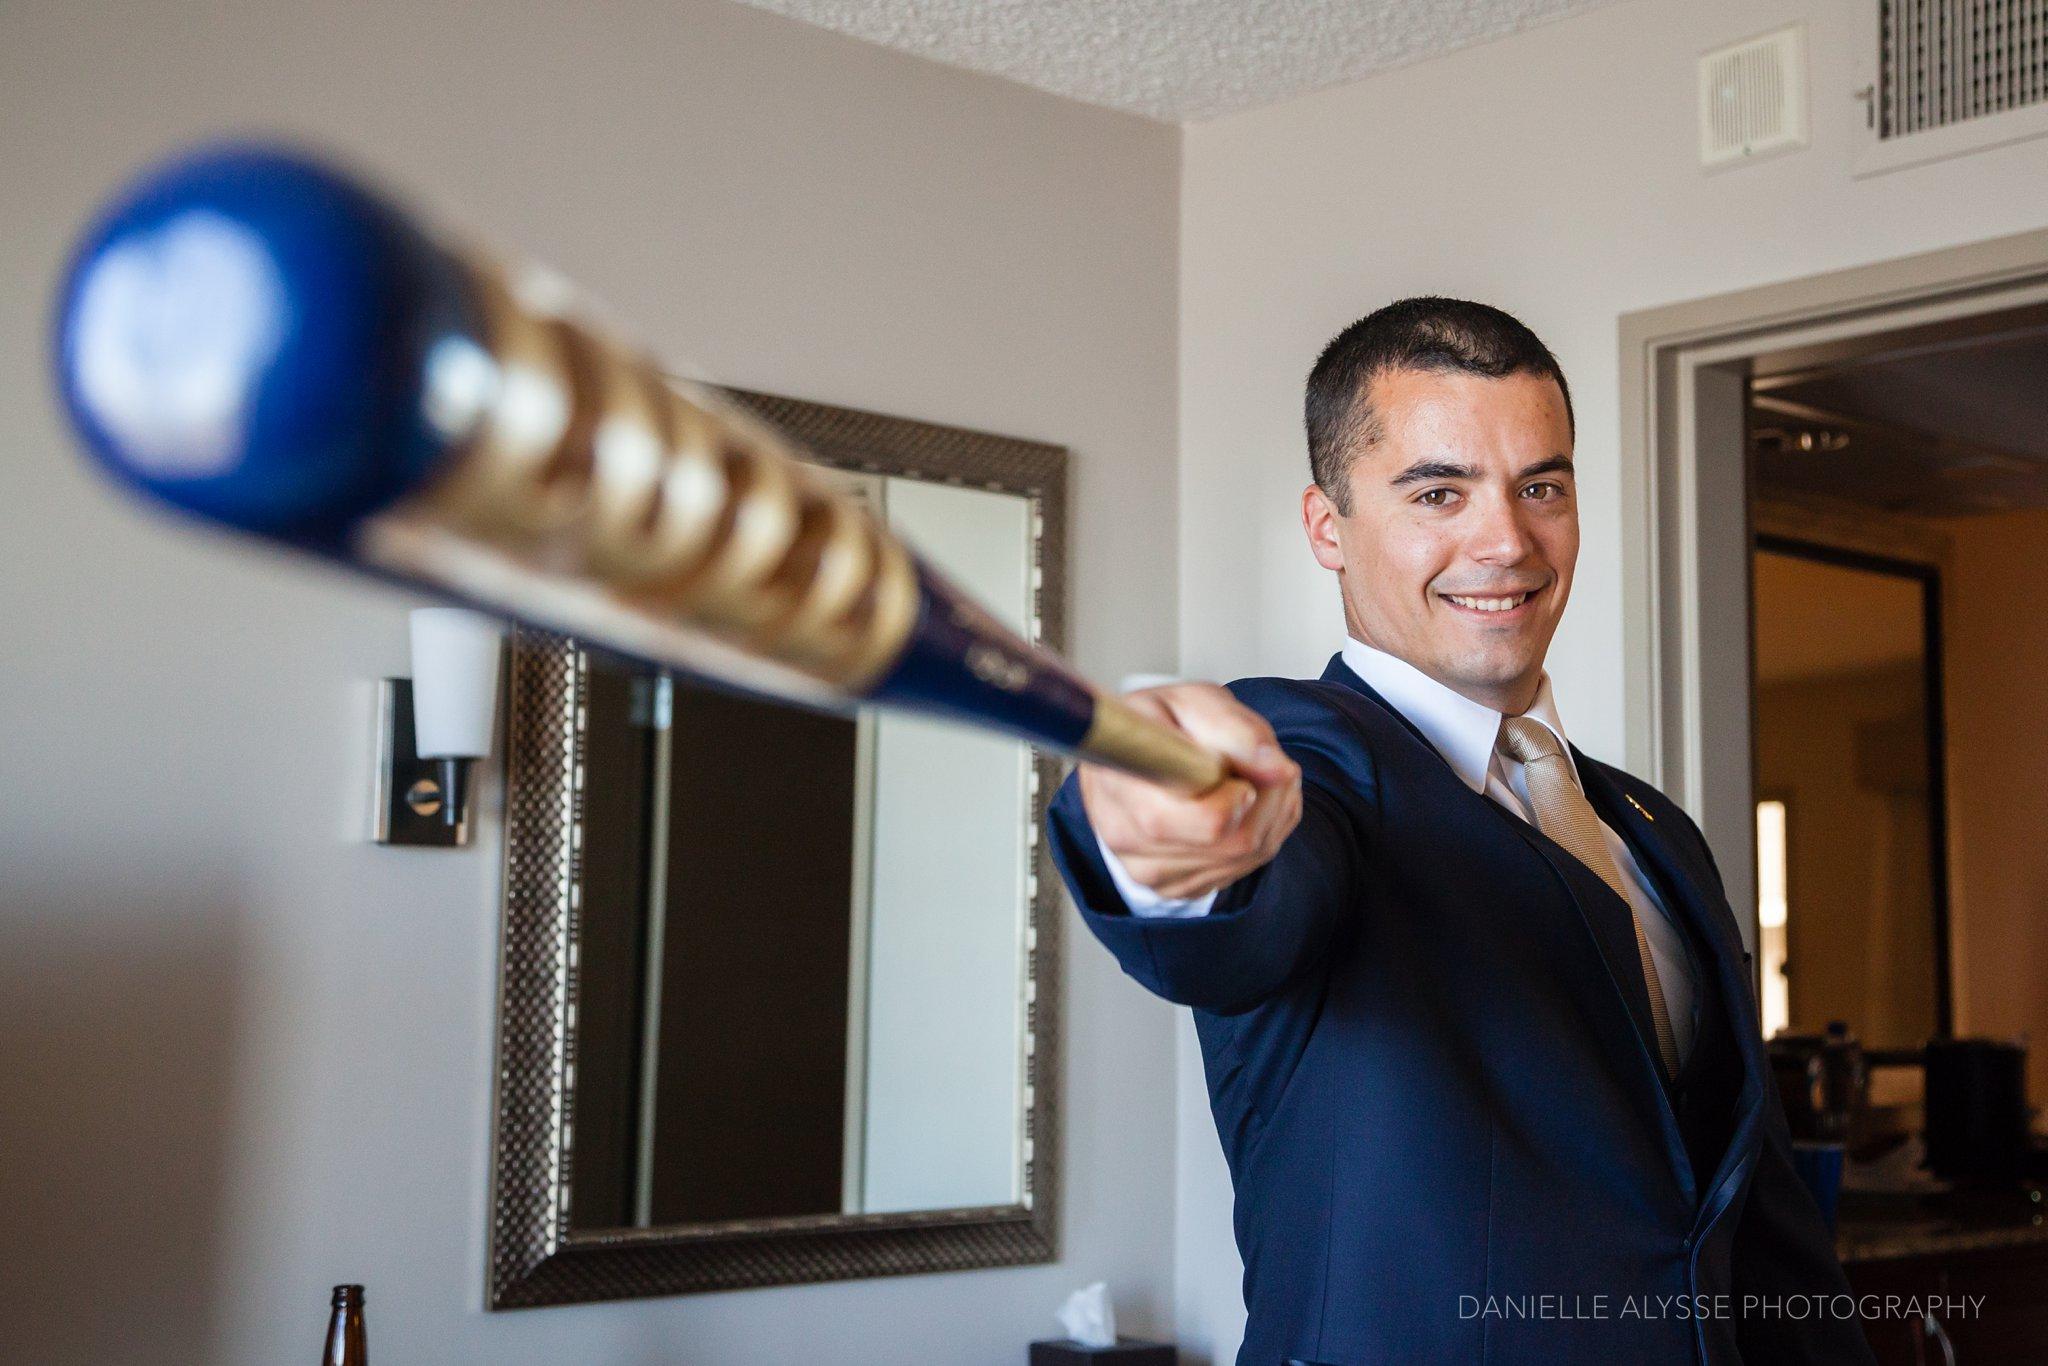 170429_blog_kimberly_ben_wedding_san_mateo_curiodyssey_danielle_alysse_photography_sacramento_photographer0087_WEB.jpg